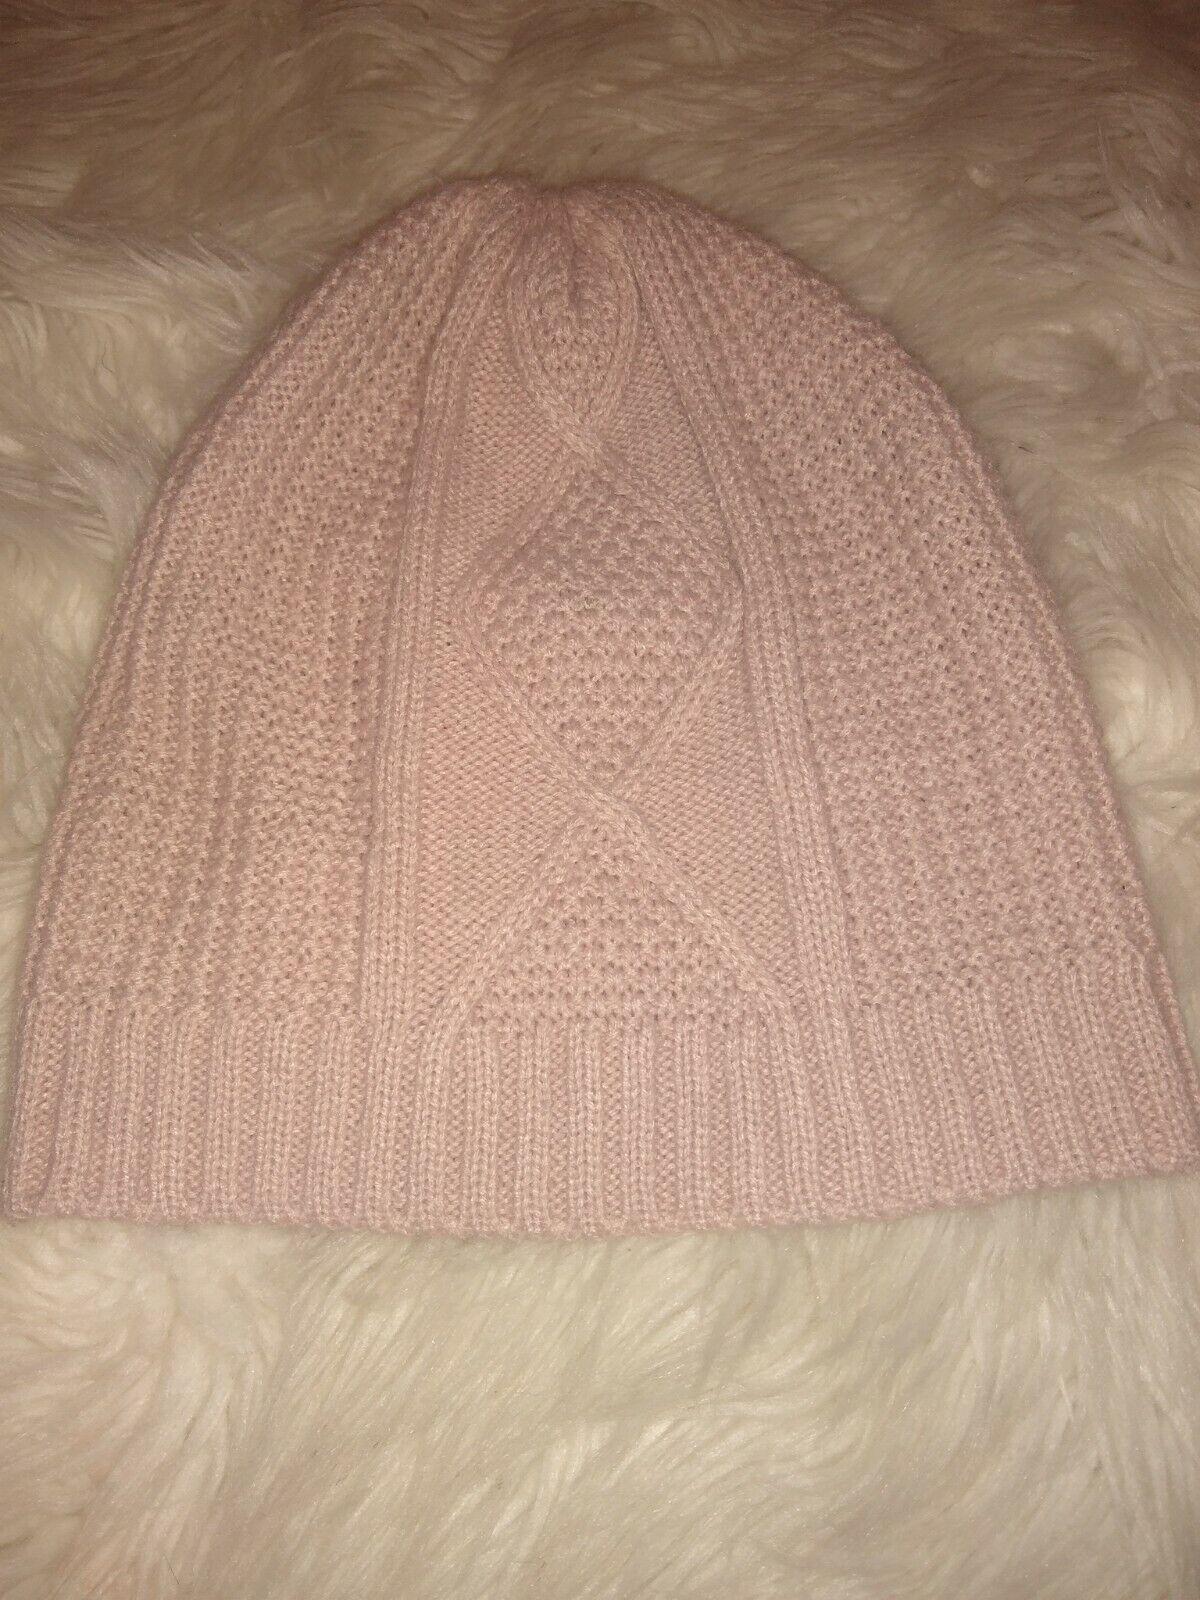 TJD Womens Beanie Hat Dusty Rose Slouchy Toboggan… - image 1